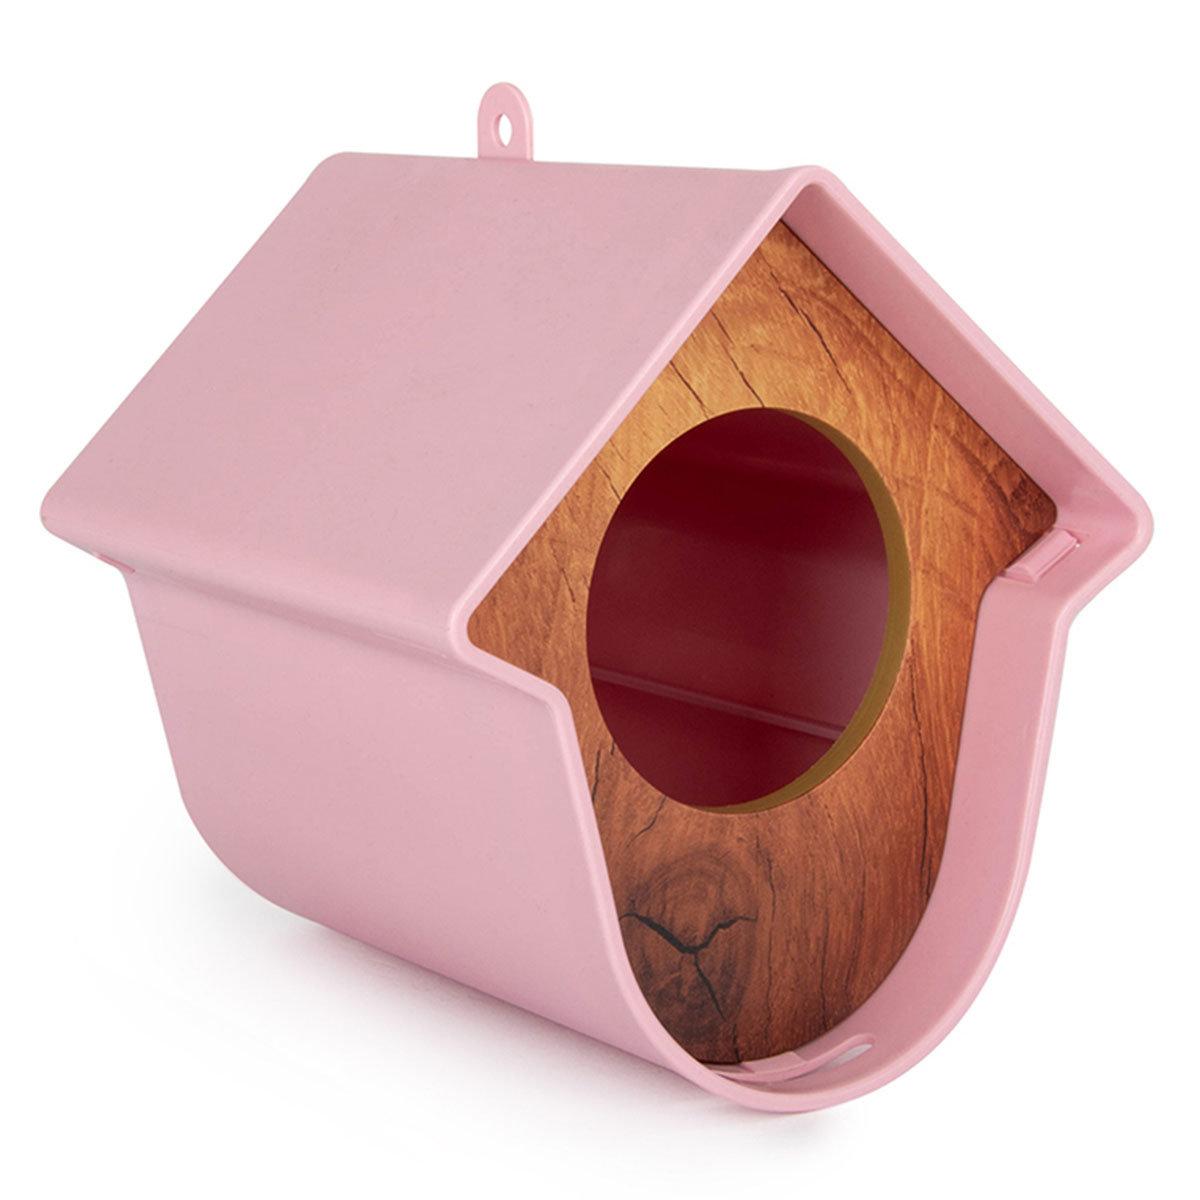 Erdnussbutterglashalter Evie, 13x15x17 cm, Kunststoff, rosa   #2